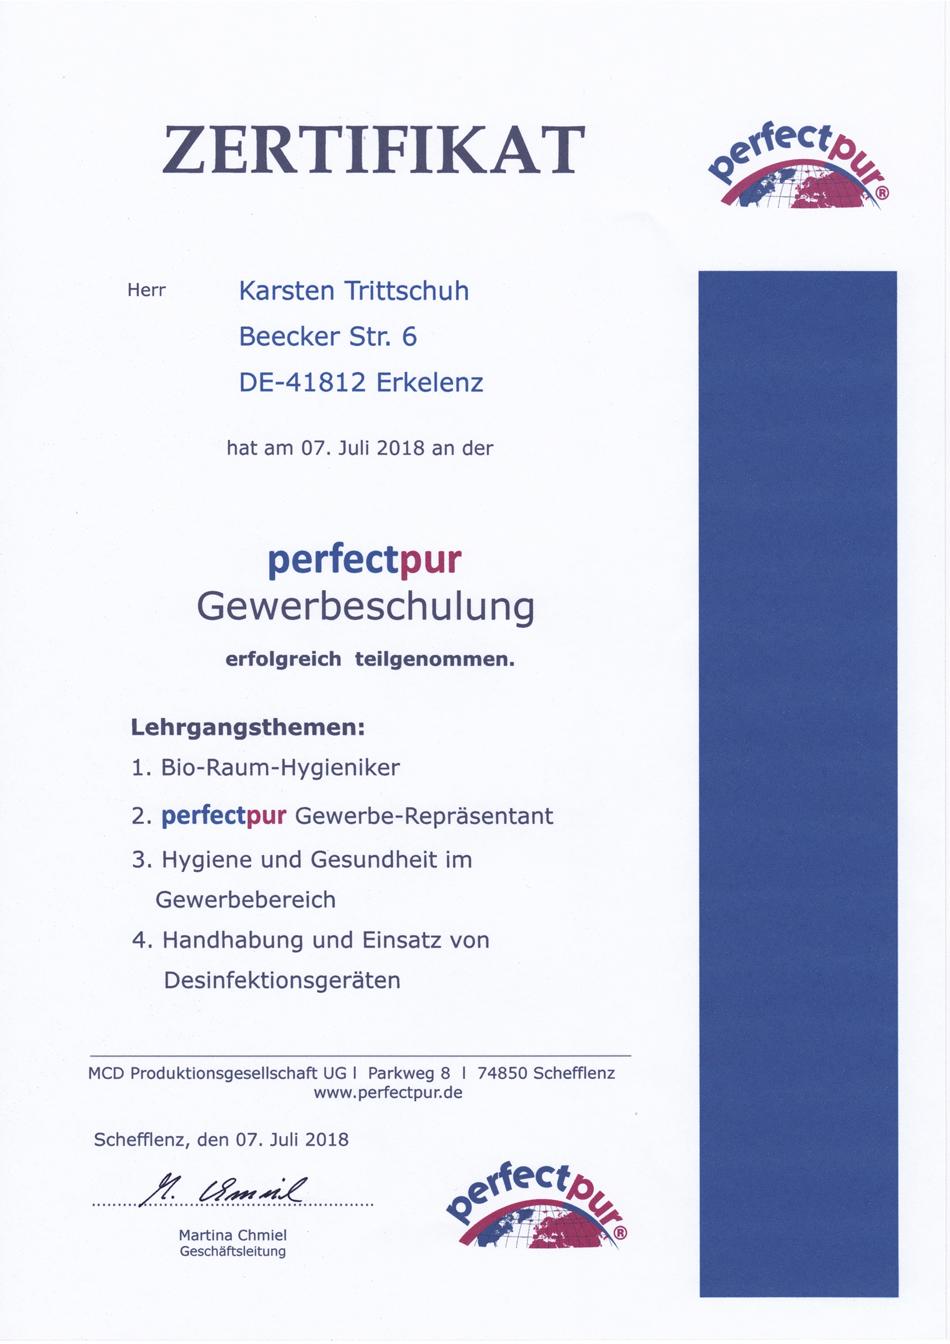 pp_zertifikat_k